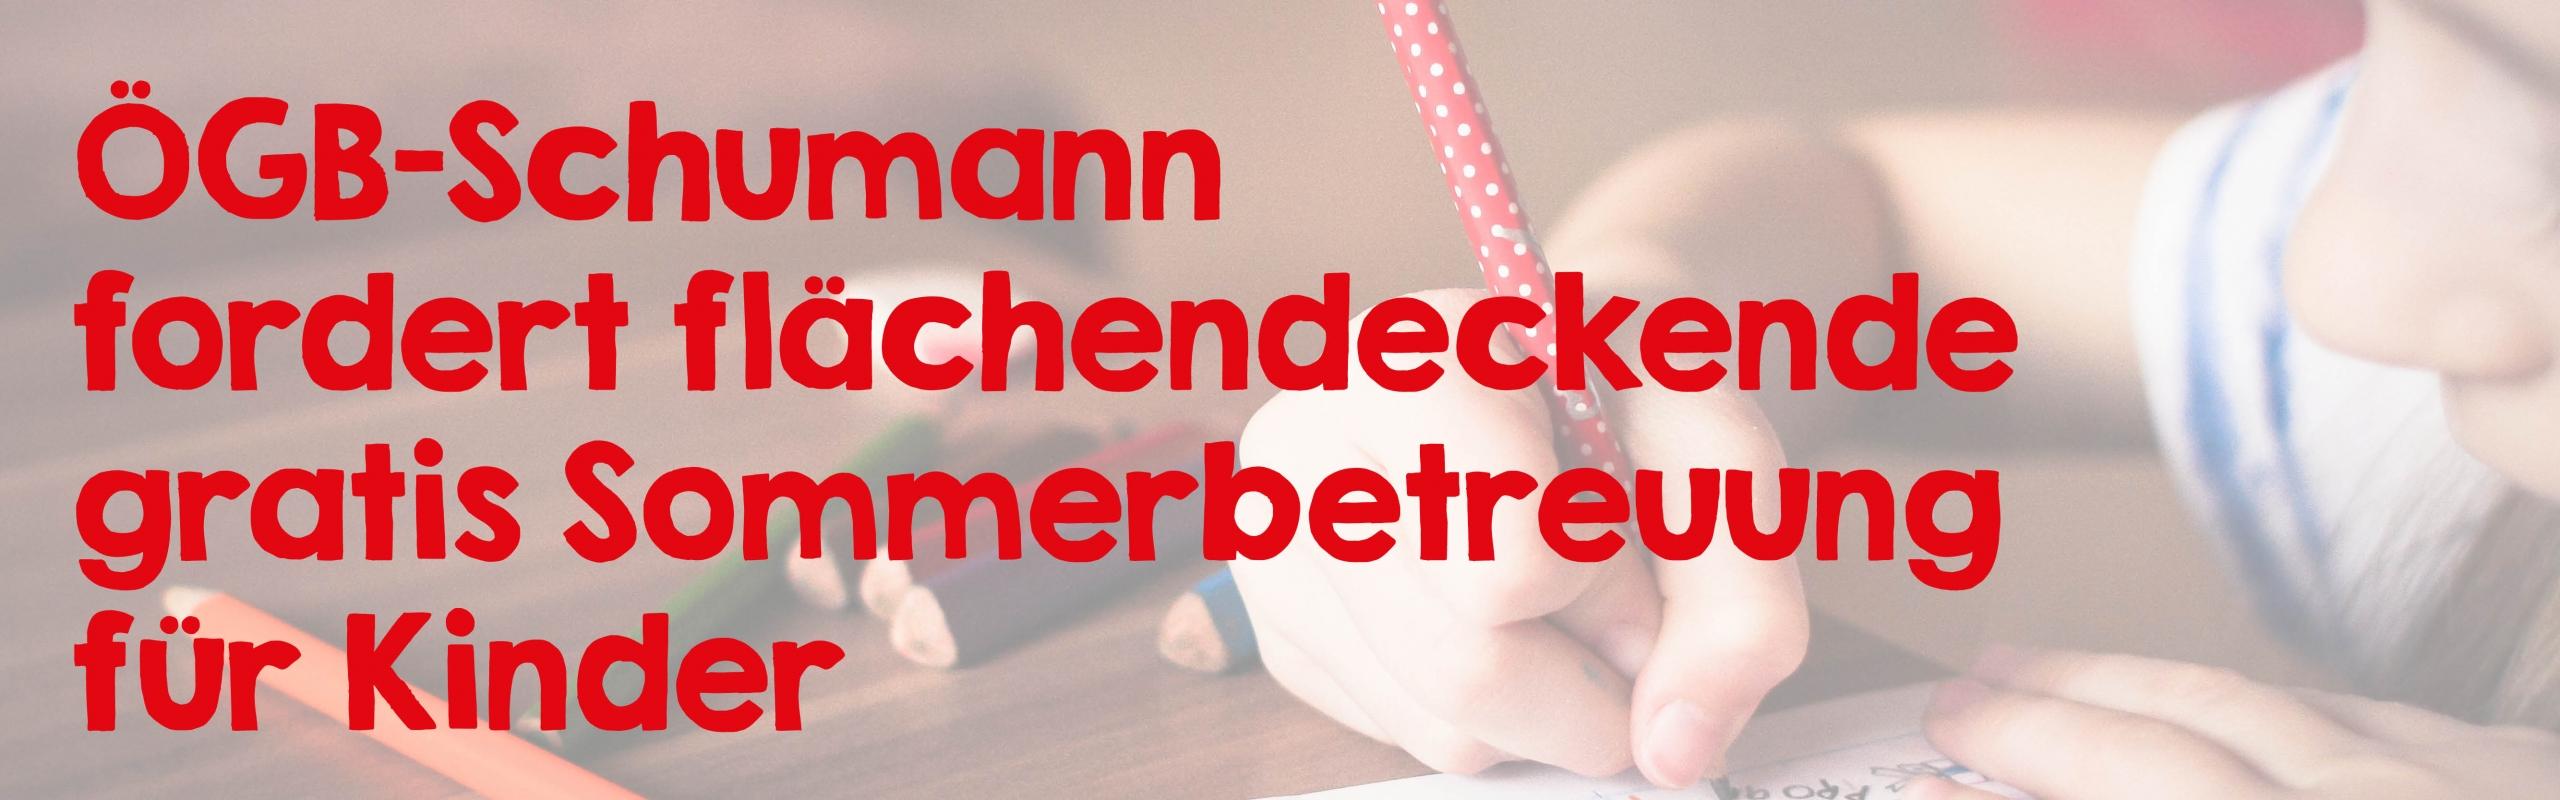 Korinna Schumann_Kinderbetreuung_Banner